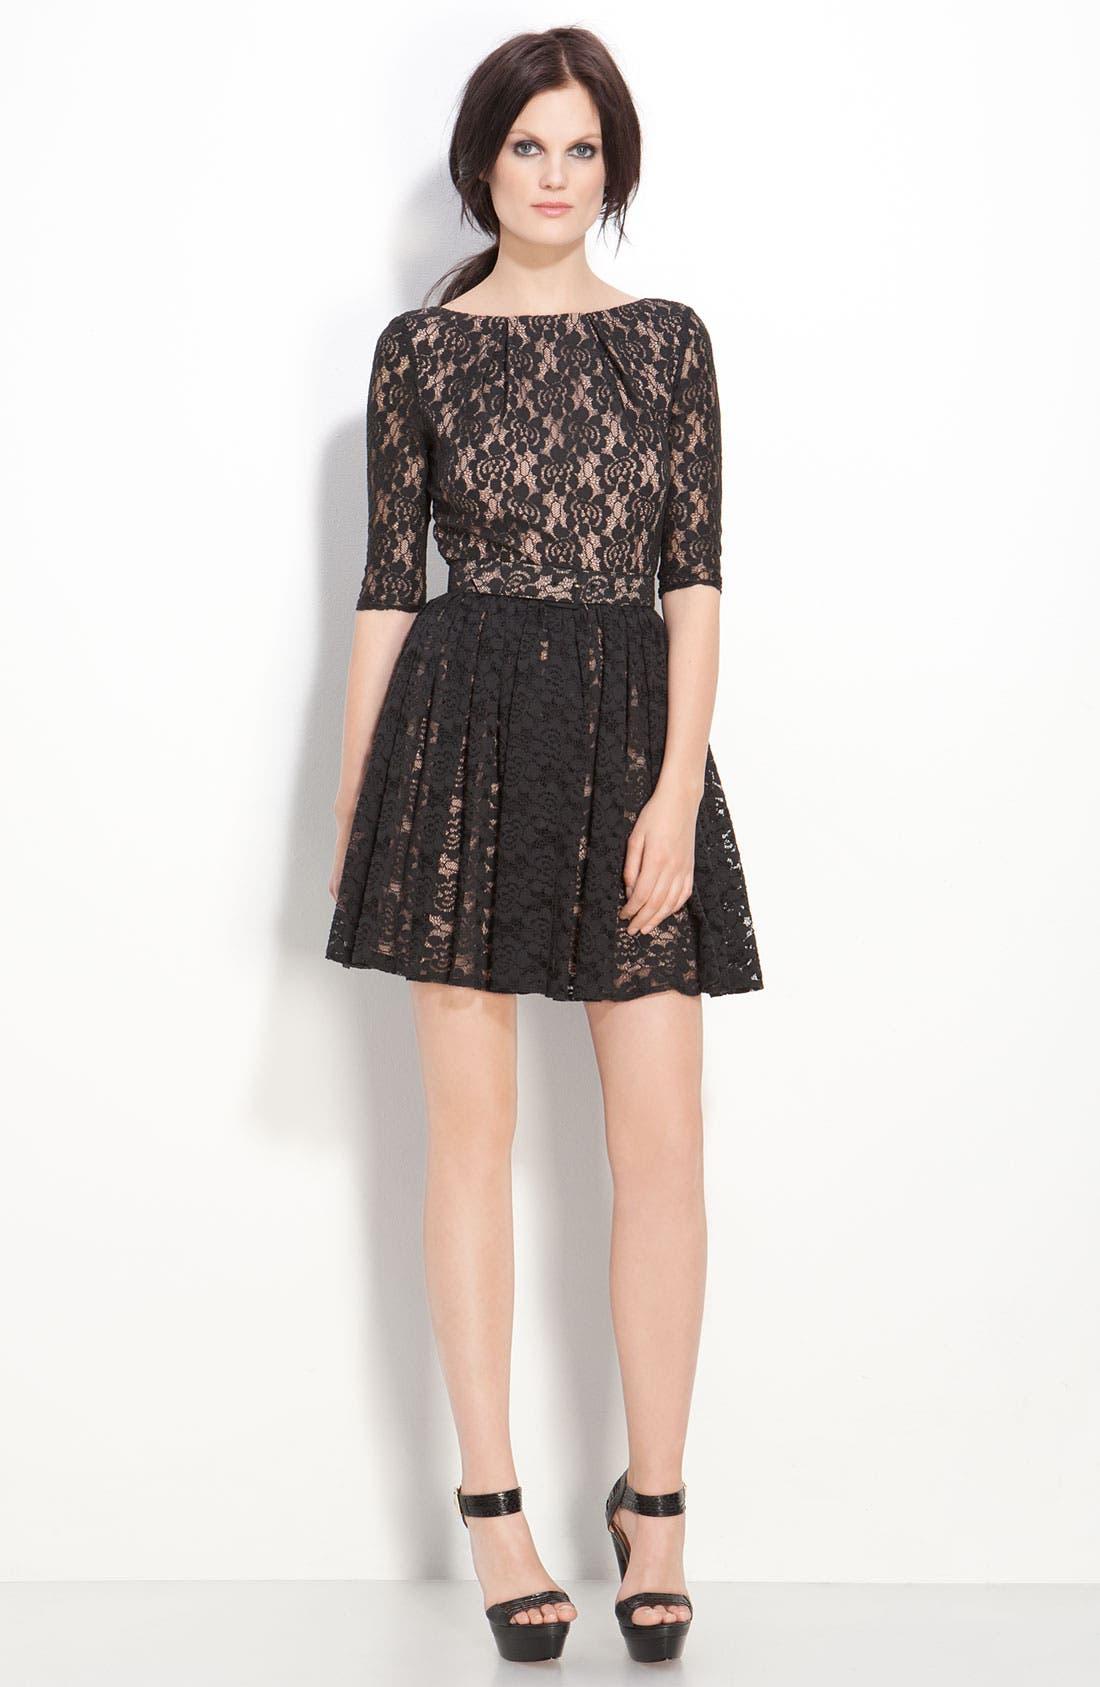 Alternate Image 1 Selected - Rachel Zoe 'Amanda' Belted Lace Dress